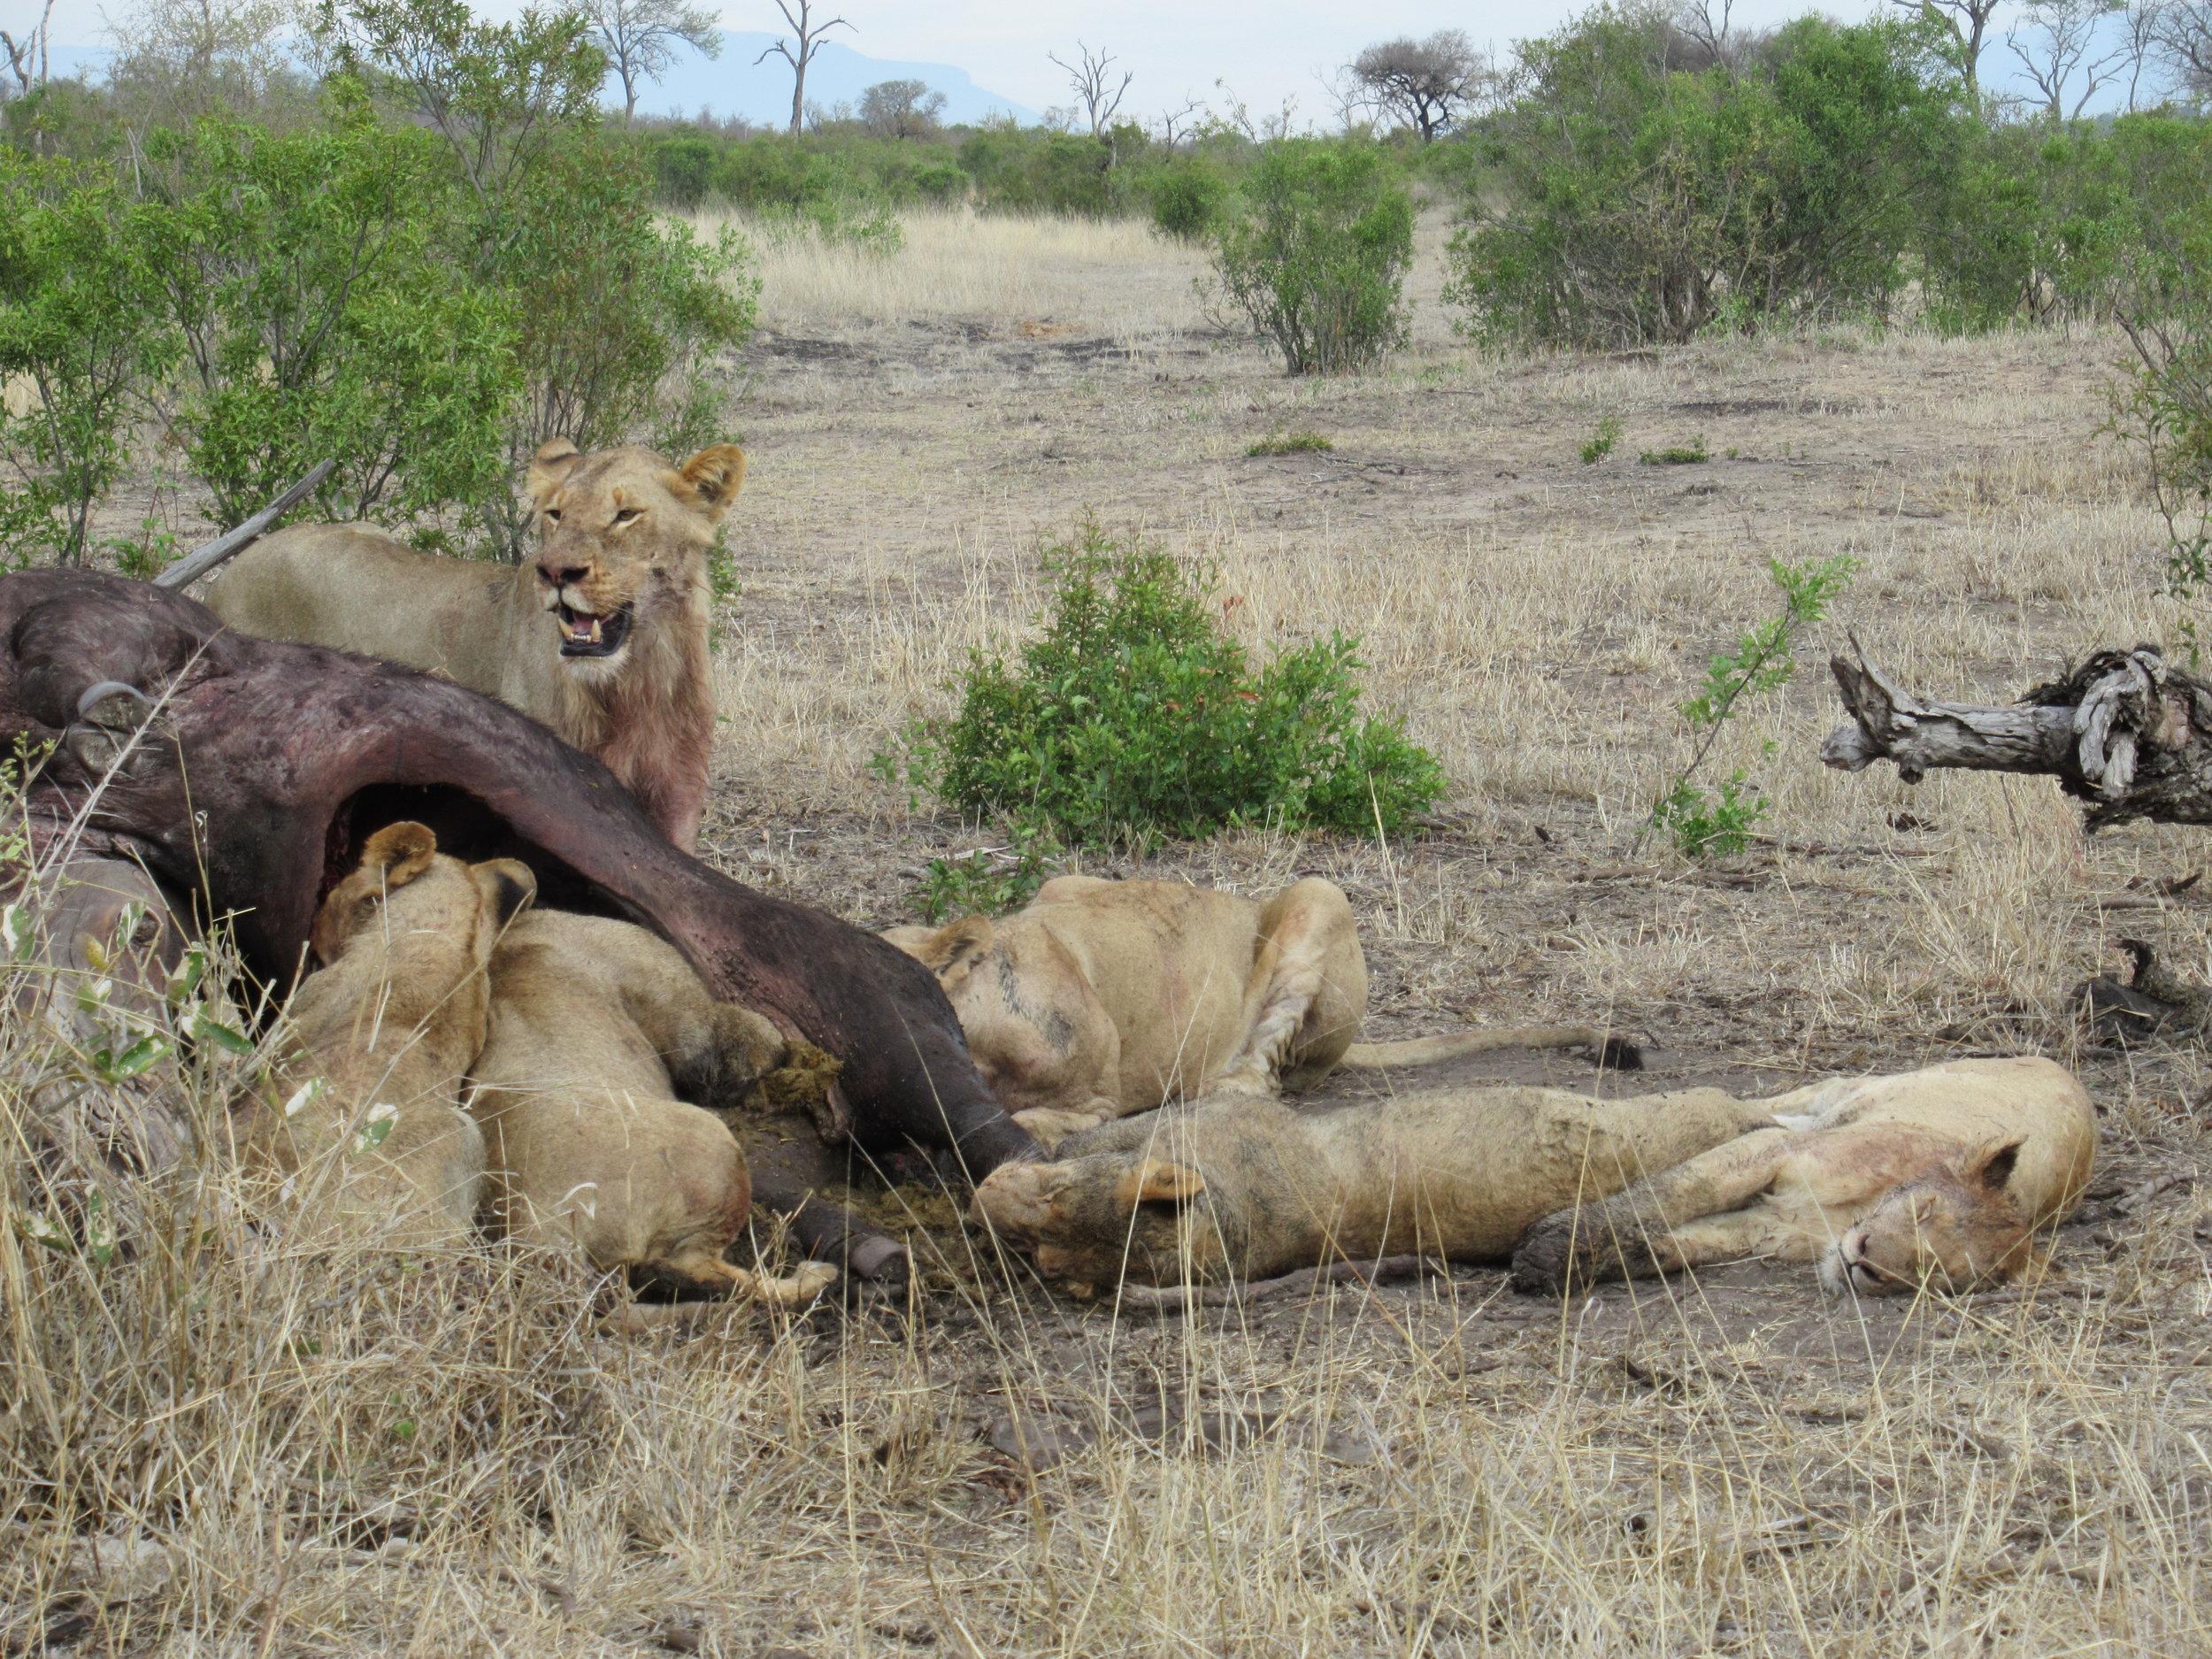 Lion pride feasting on a buffalo